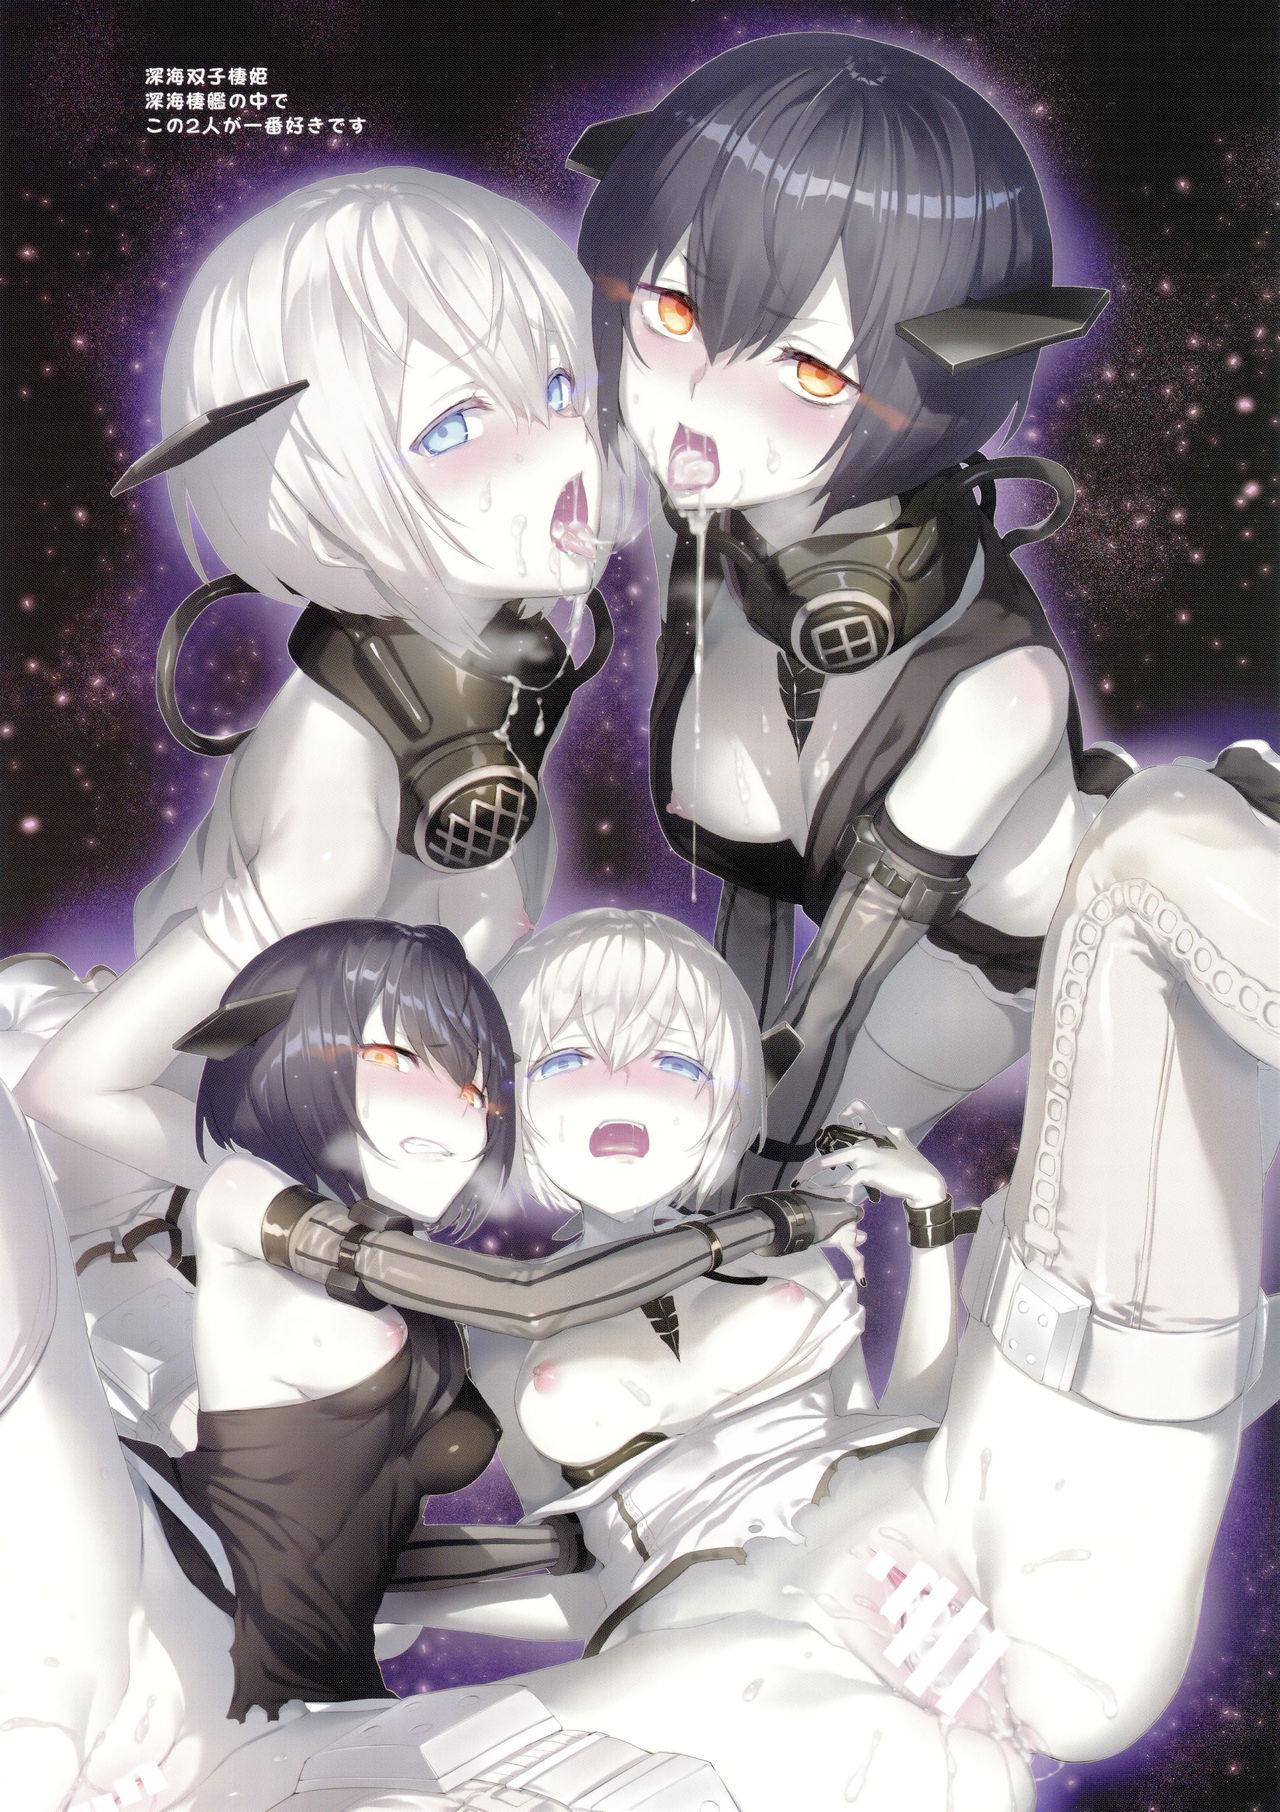 Kyoku&Daiseikou Kyou 3